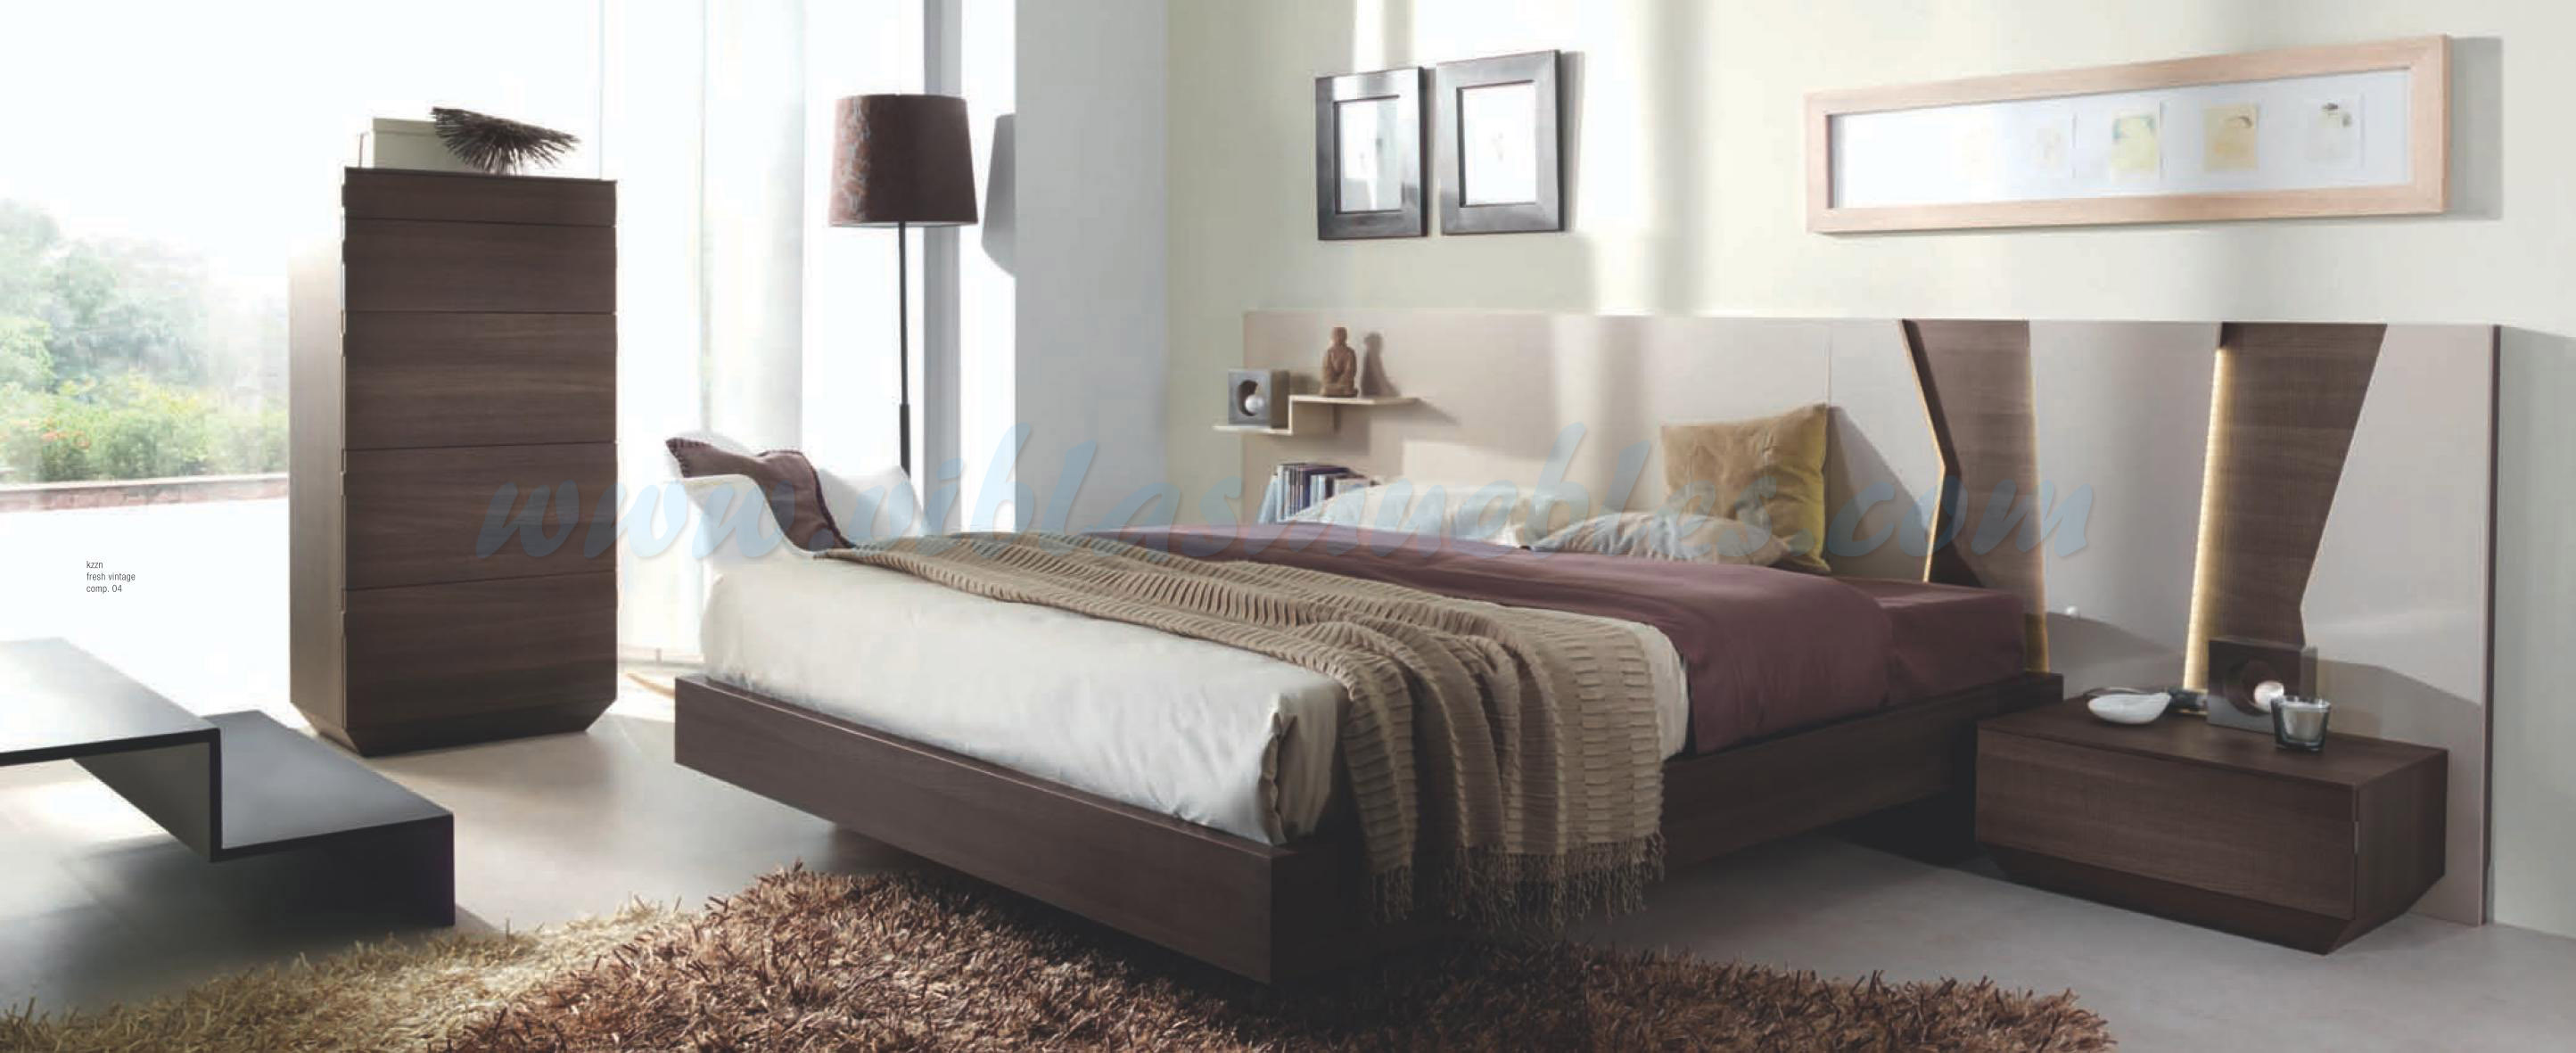 Dormitorio matrimonio muebles viblas tienda en valencia for Medidas dormitorio matrimonio